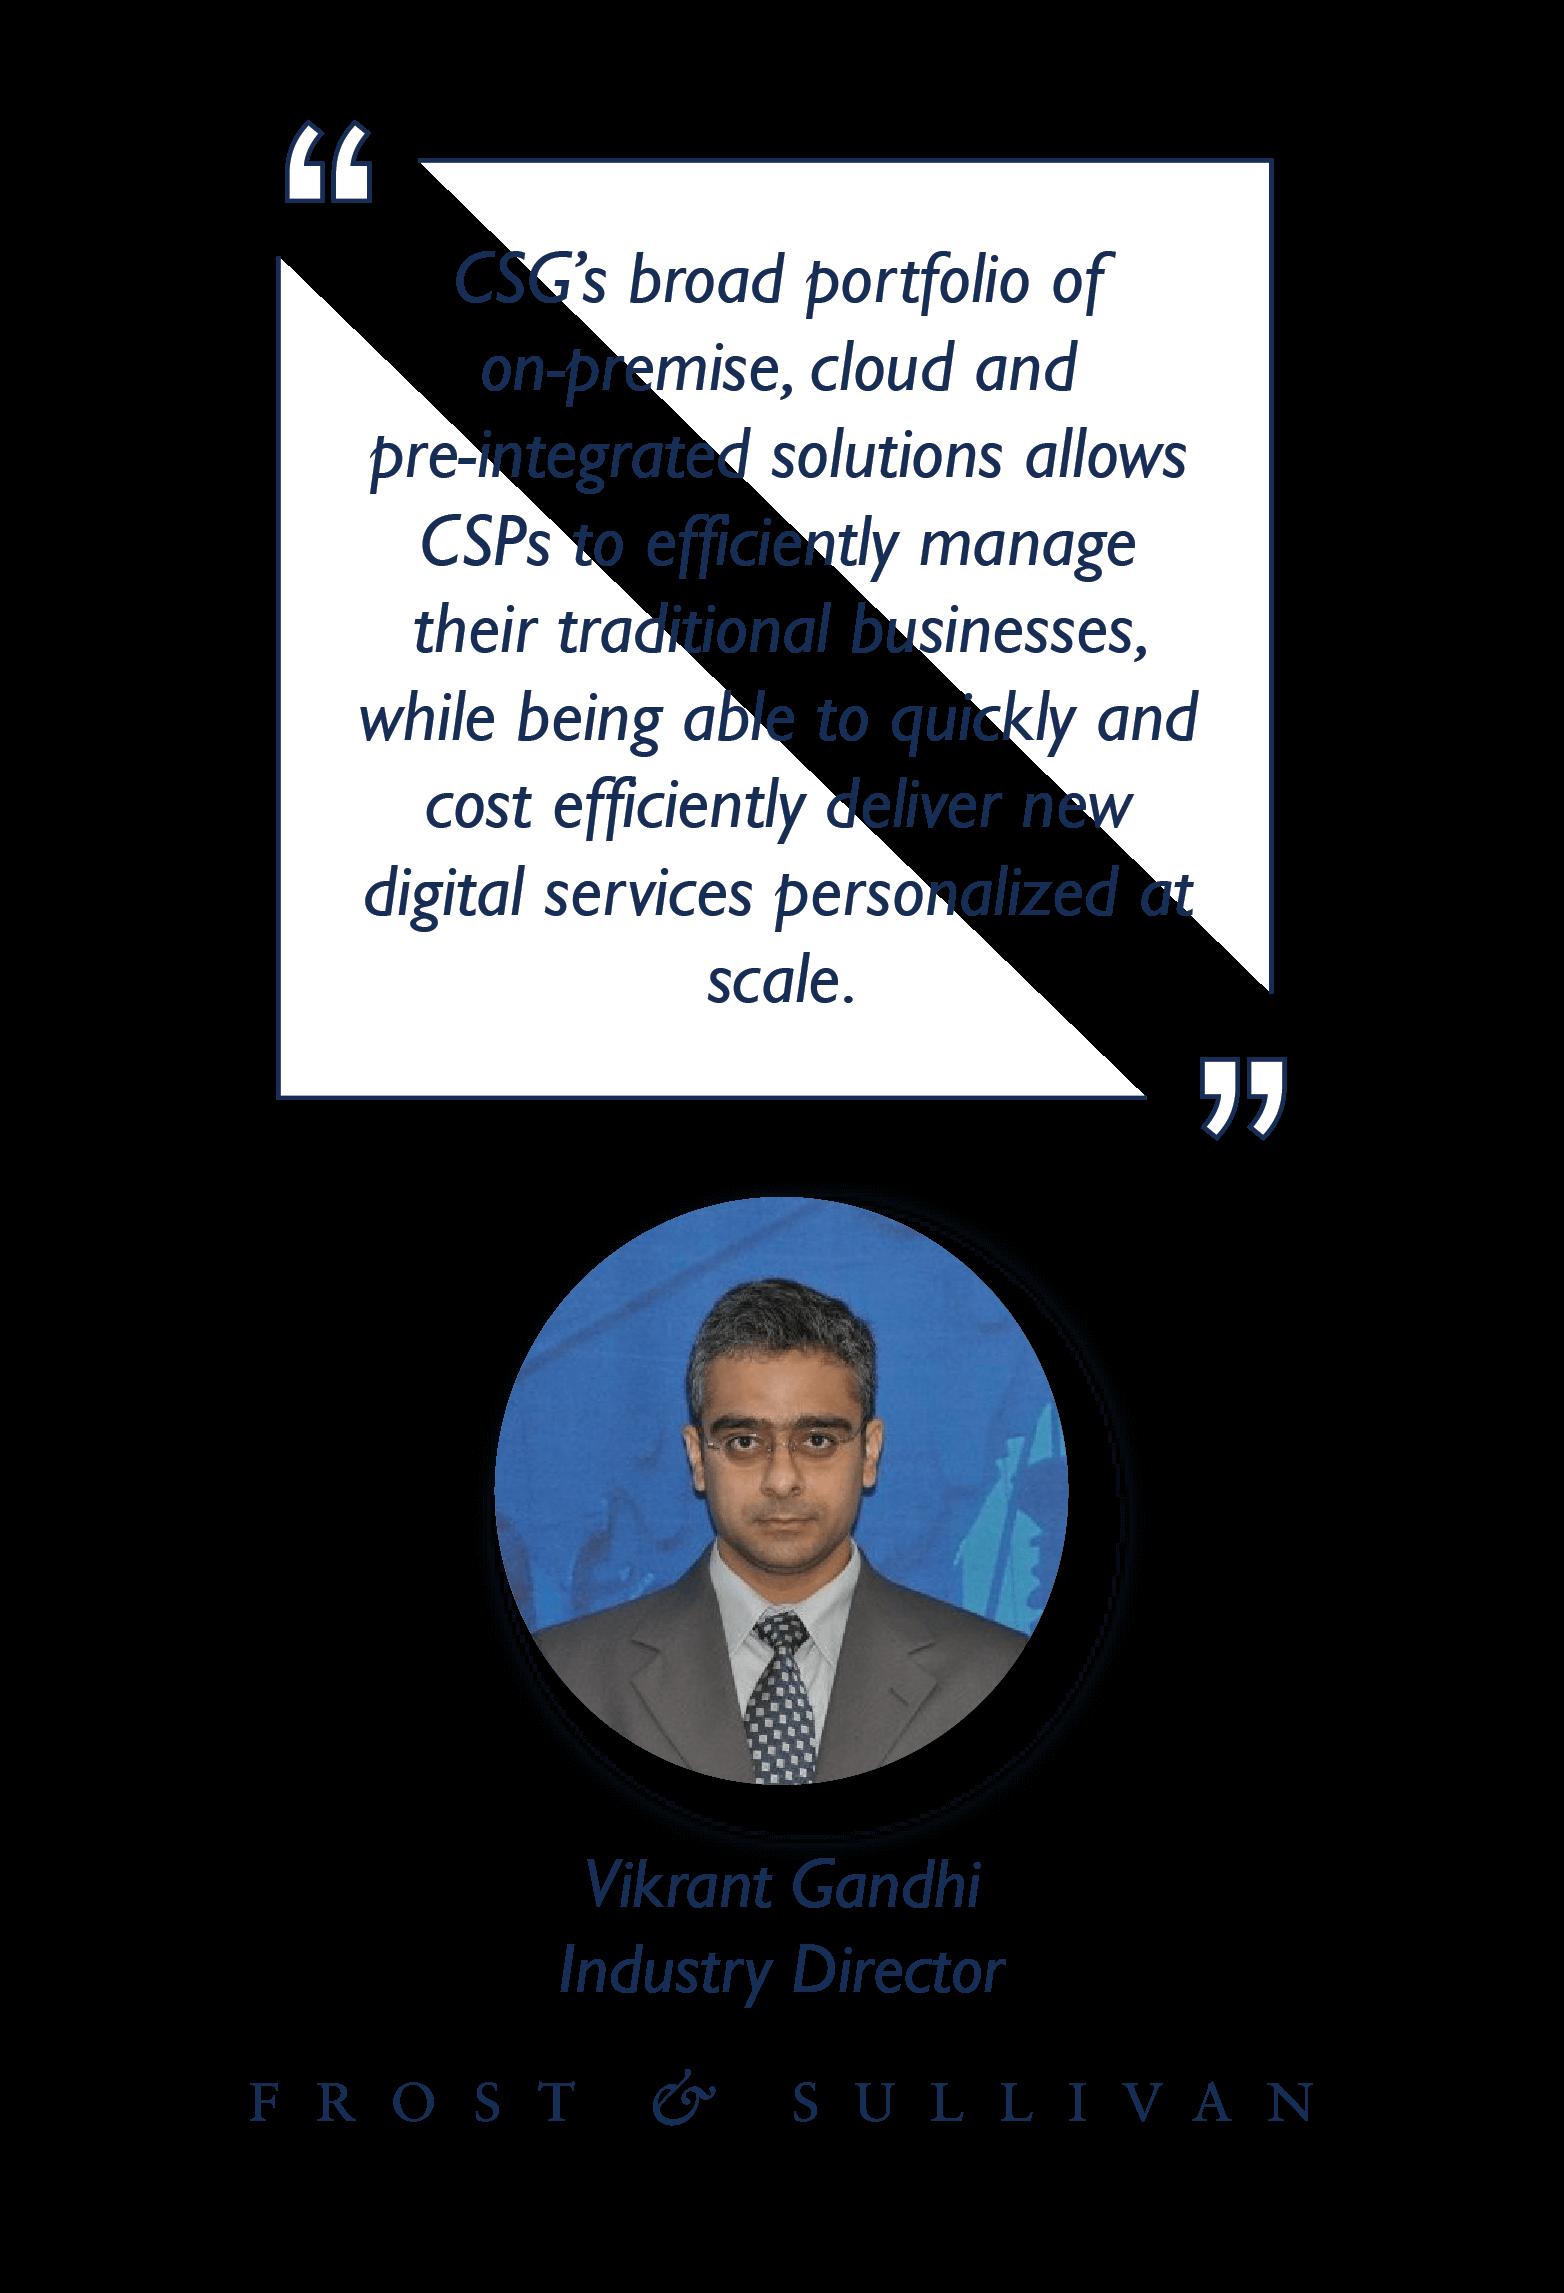 CSG Quote